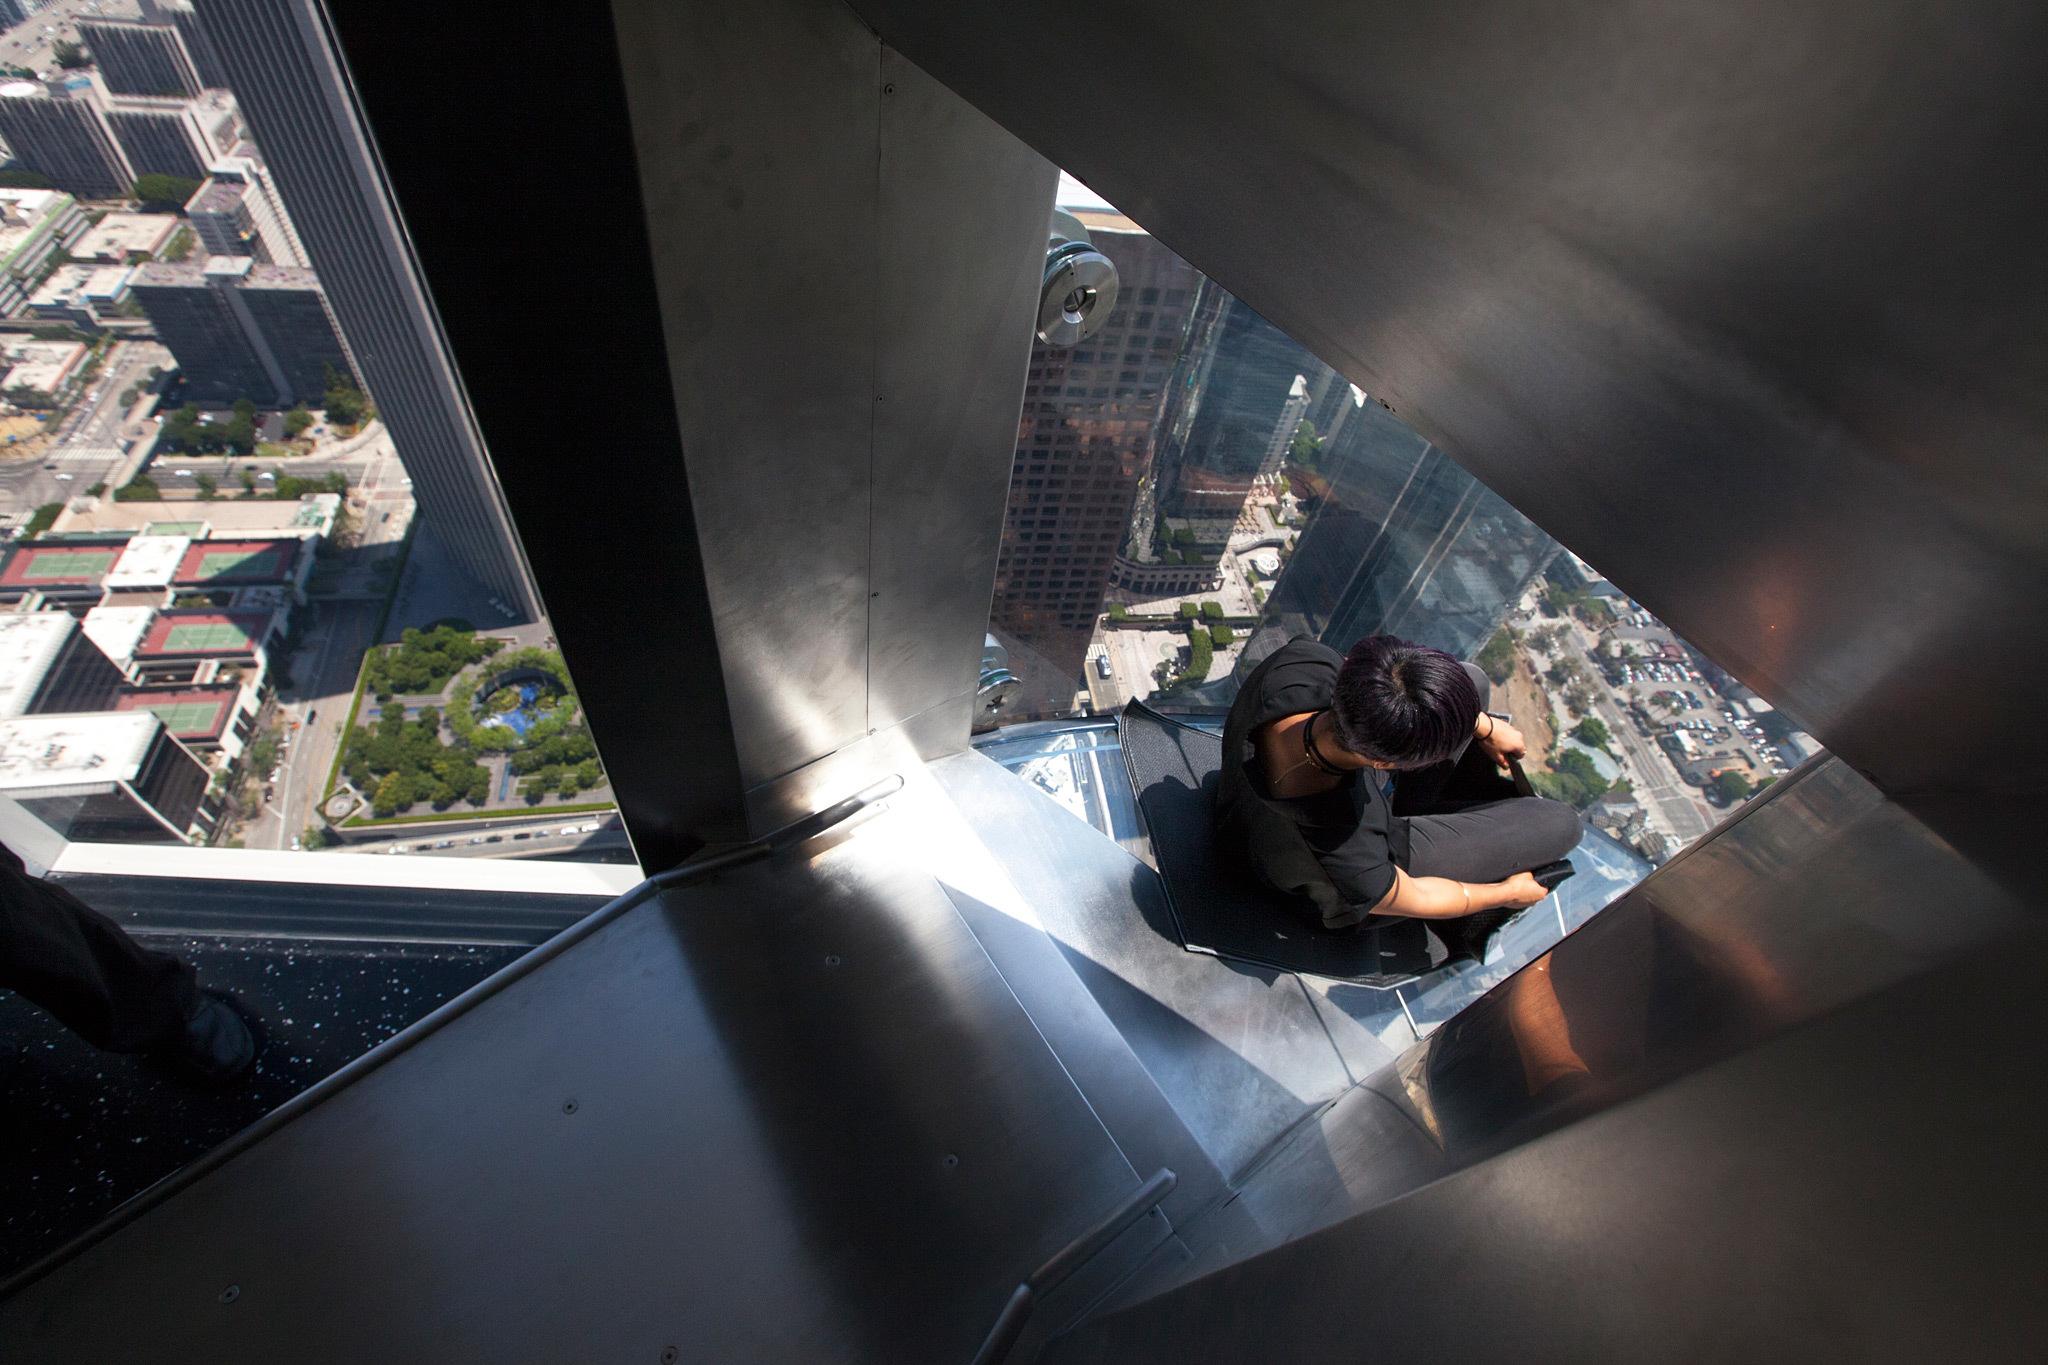 Skyspace La Slide >> Braving the glass Skyslide at the US Bank Tower's Skyspace